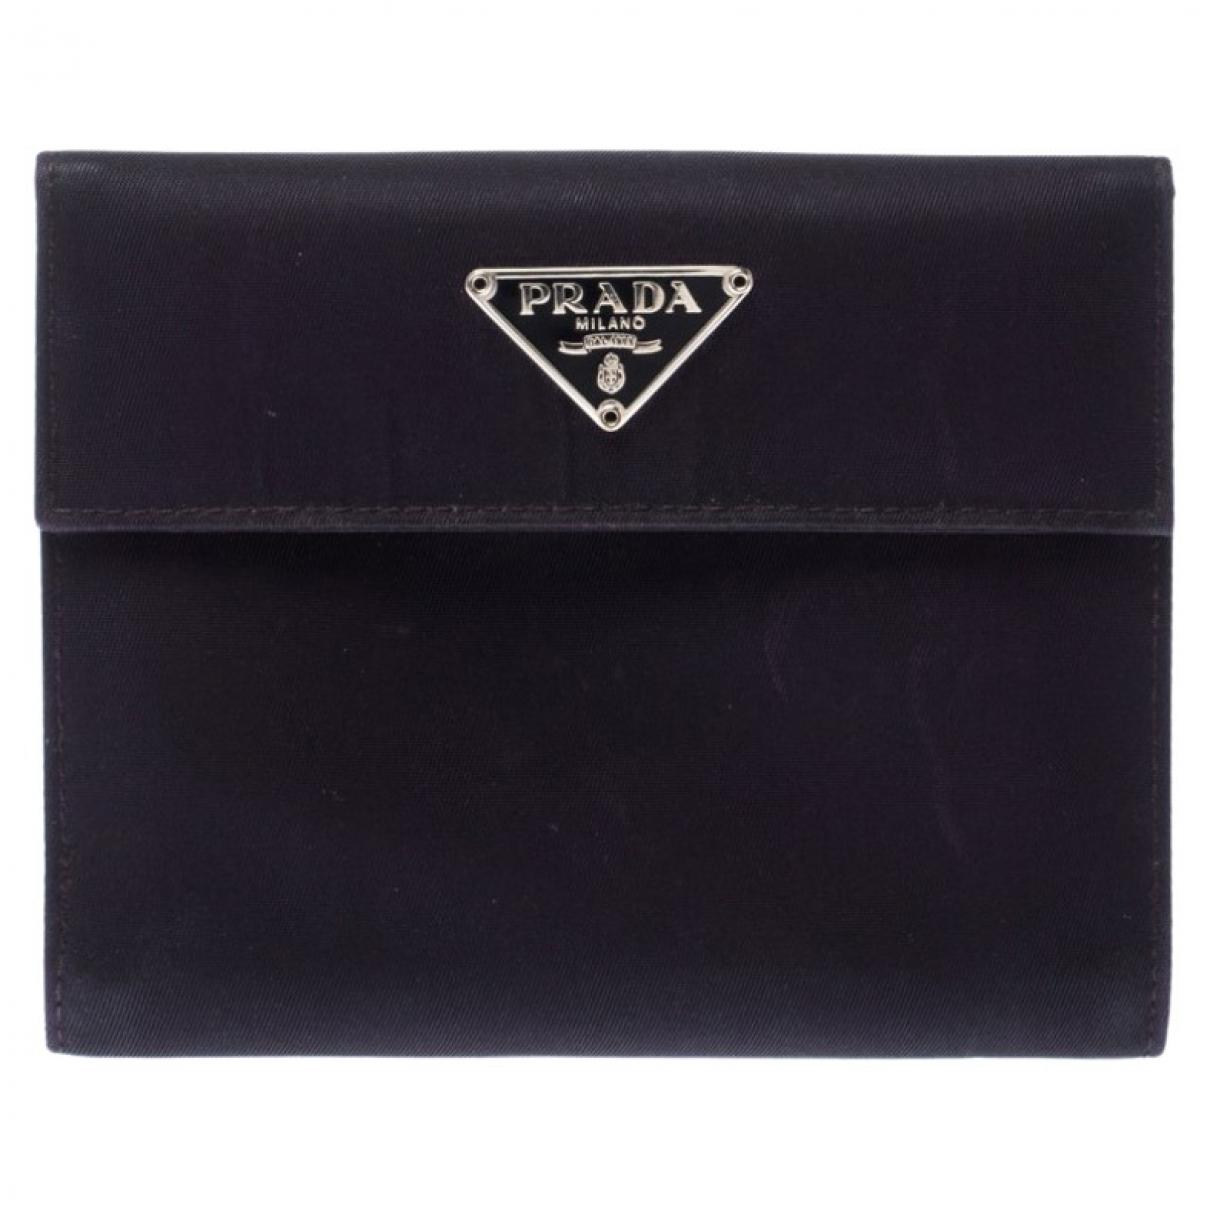 Prada \N Portemonnaie in  Schwarz Leder